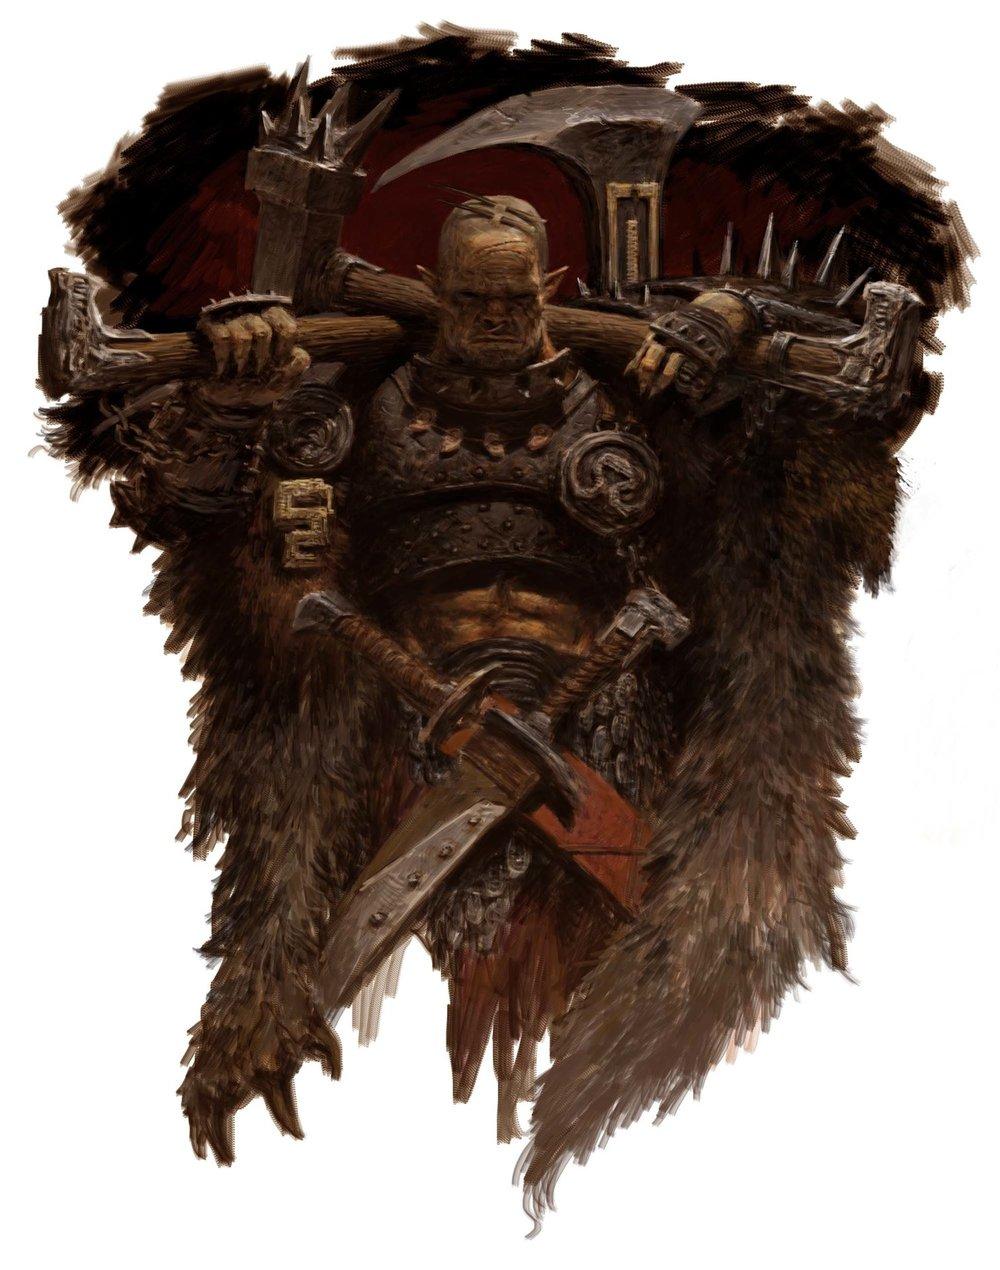 adrian-smith-wildman-orc-hero.jpg